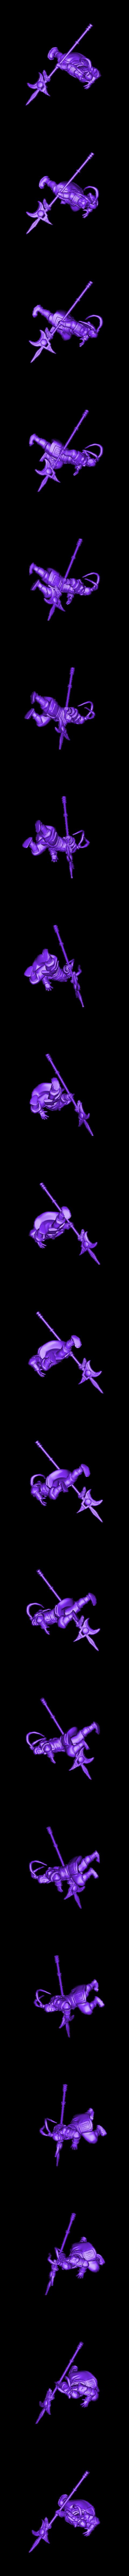 w0w_1292667.stl Download free STL file General Lv Bu • 3D printable model, stronghero3d